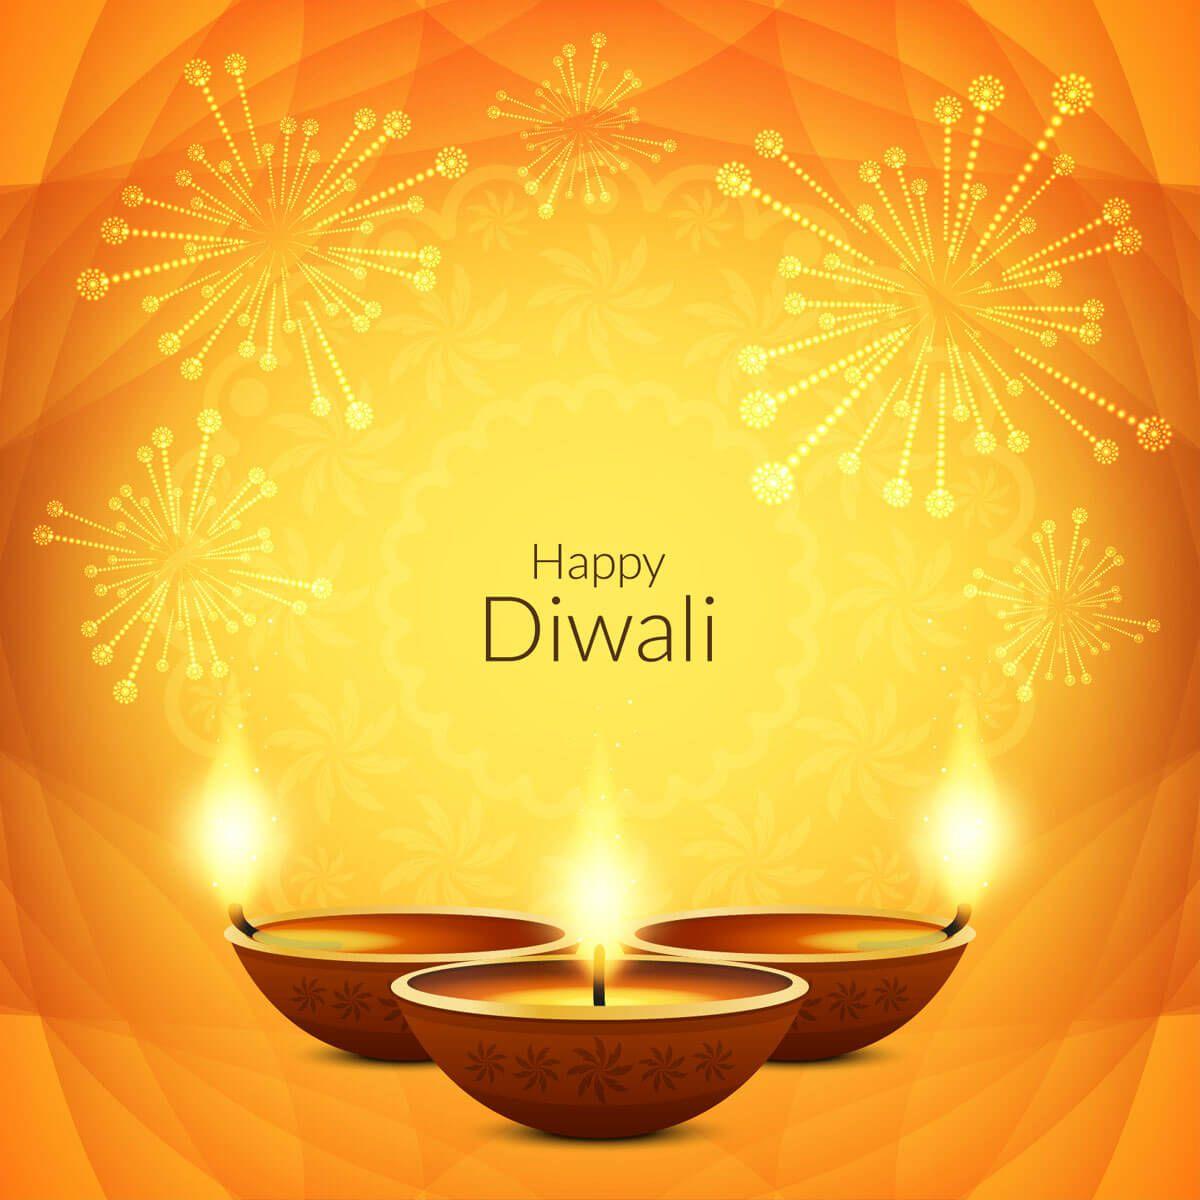 Diwali Greeting Cards Diwali Greetings Pinterest Diwali